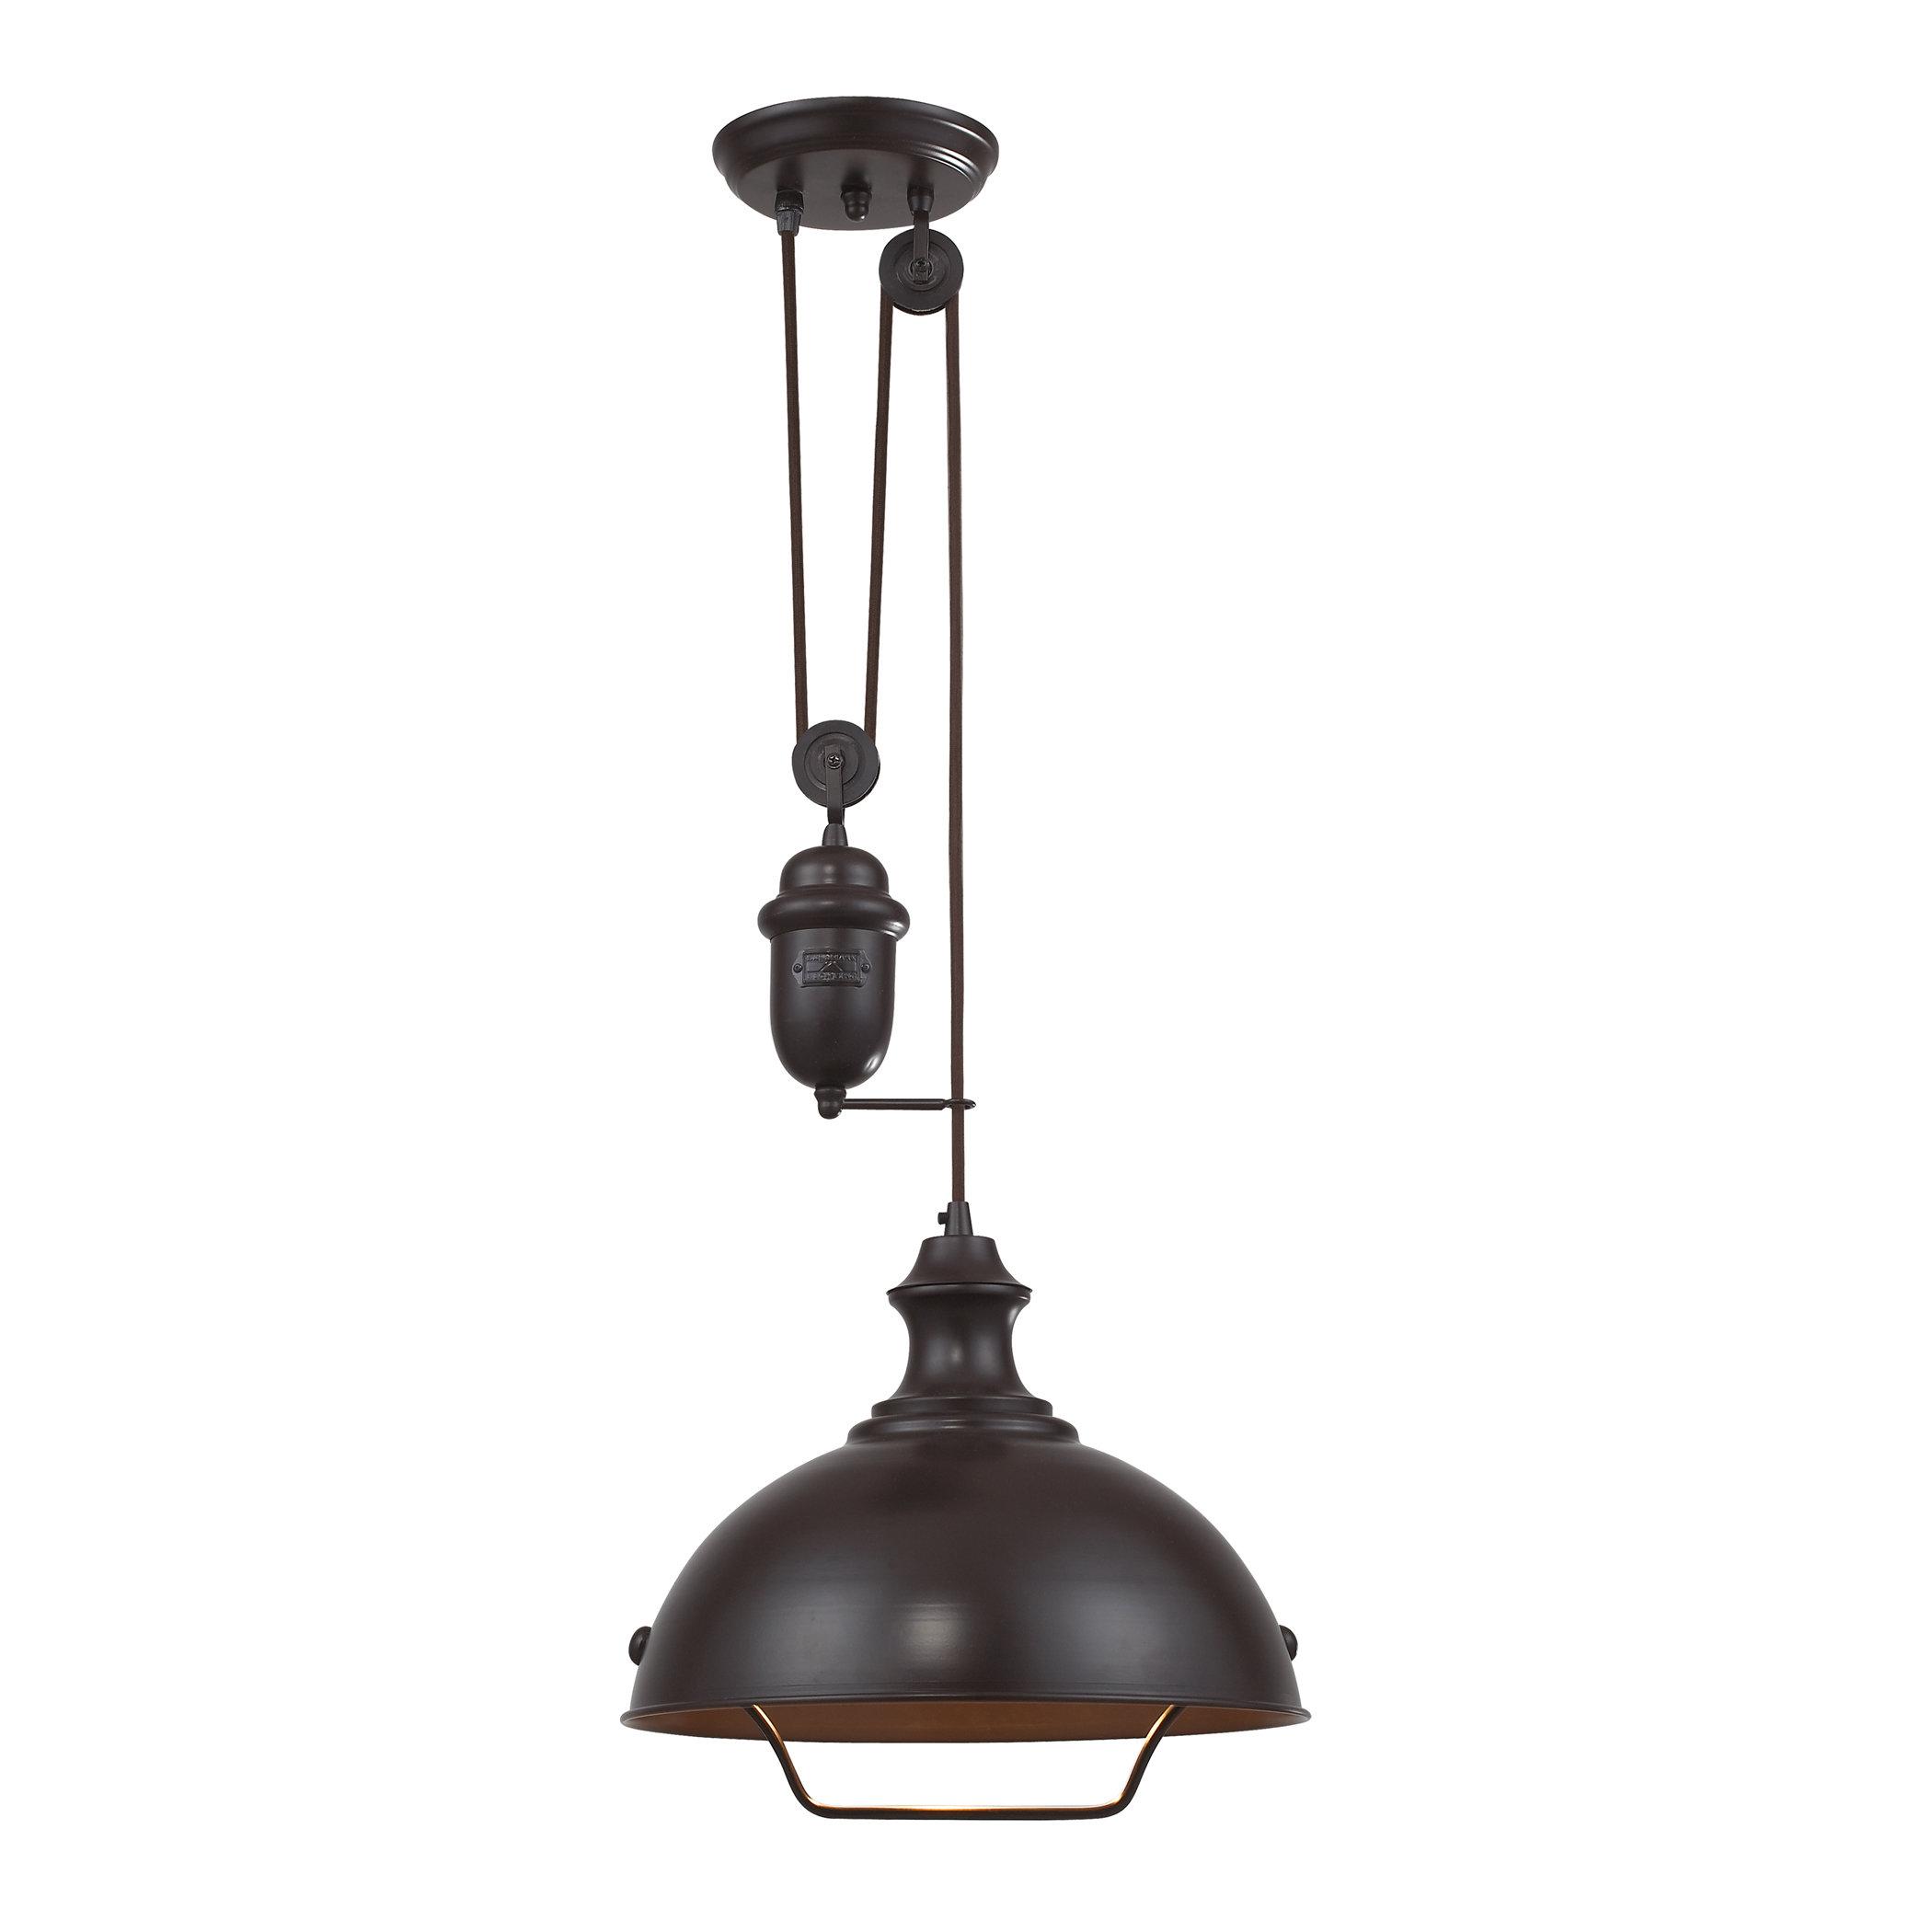 Legrand 1 Light Single Dome Pendant Intended For Stetson 1 Light Bowl Pendants (View 10 of 30)